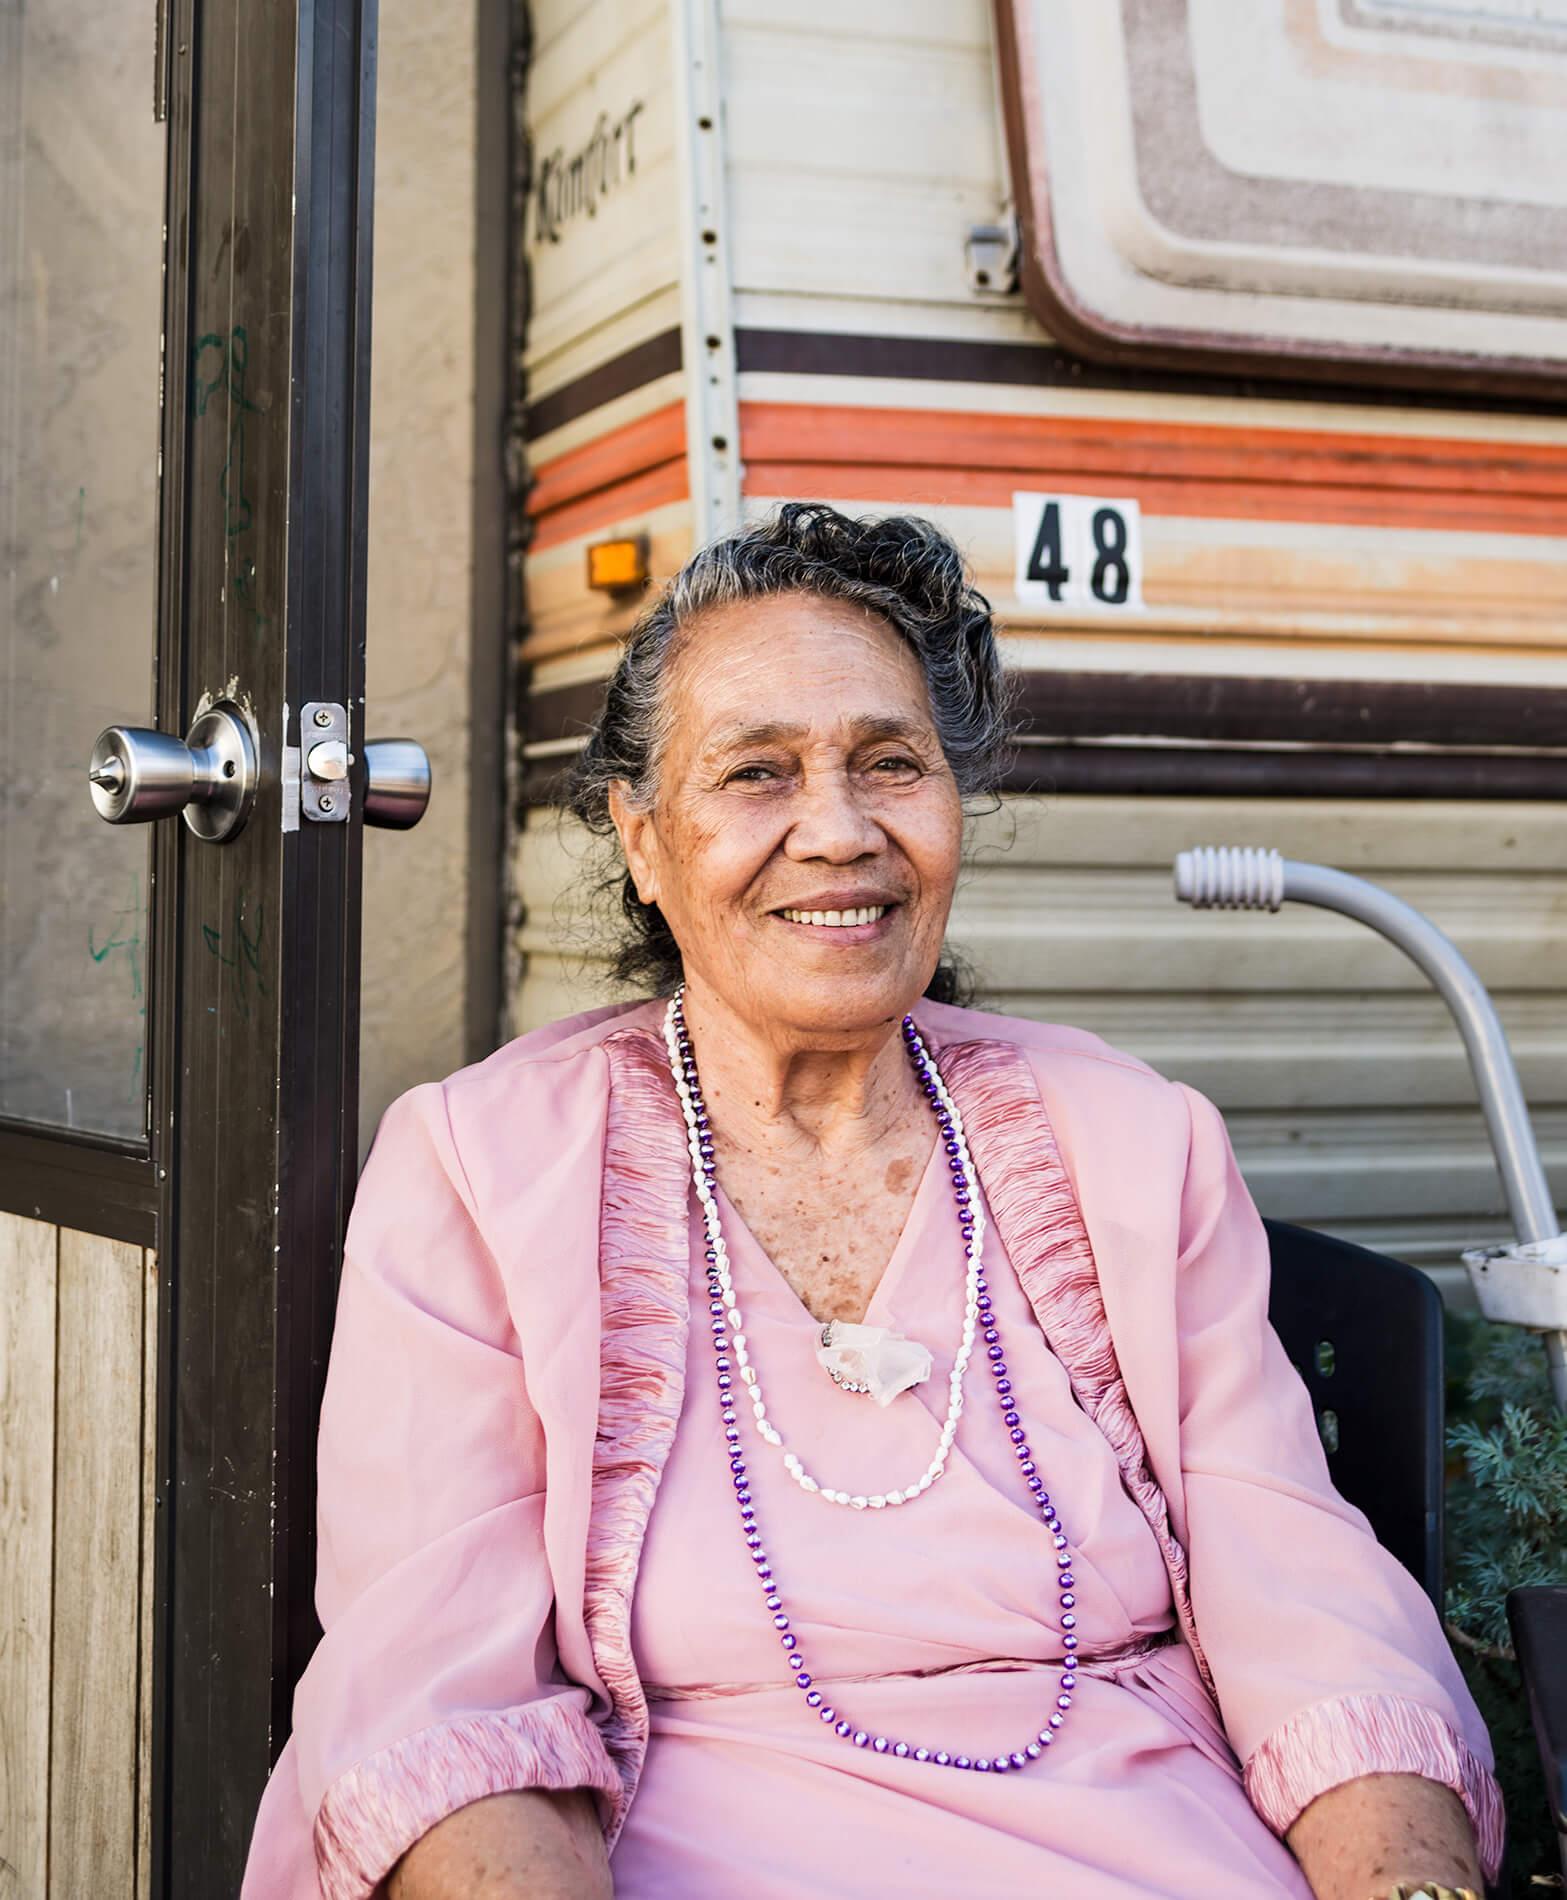 Resident of Buena Vista